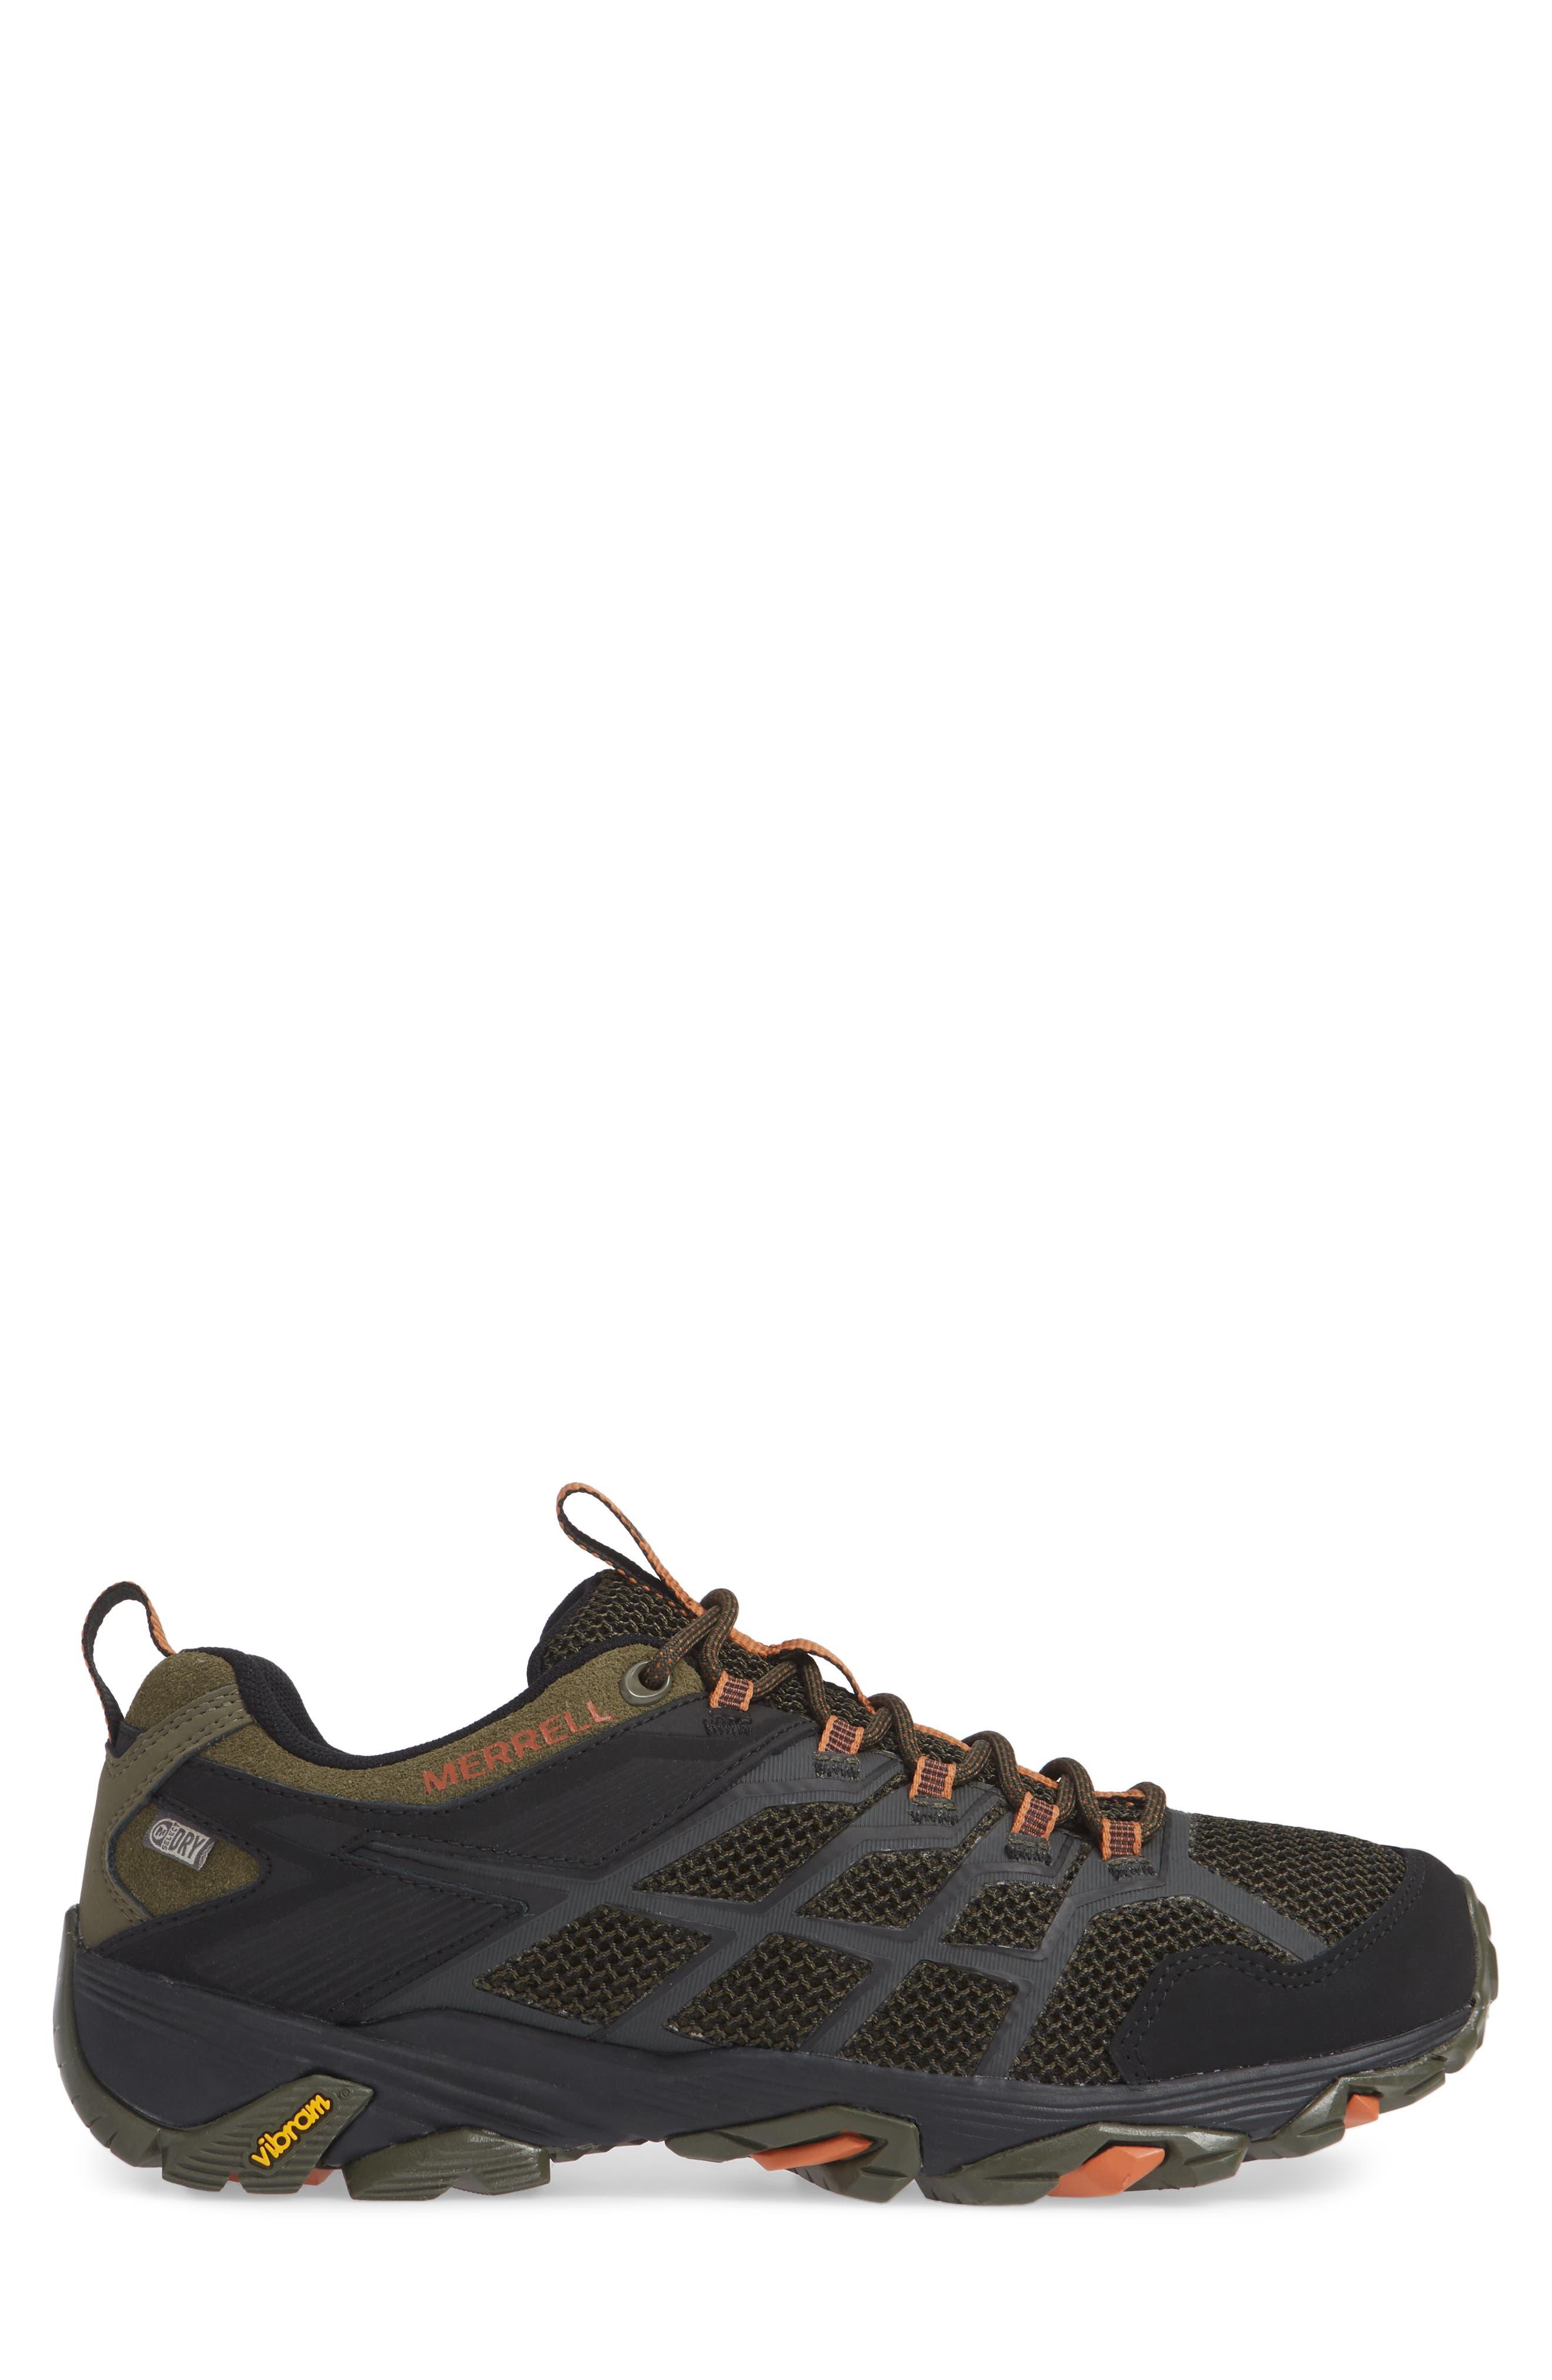 MERRELL, Moab FST 2 Waterproof Hiking Shoe, Alternate thumbnail 3, color, OLIVE/ ADOBE